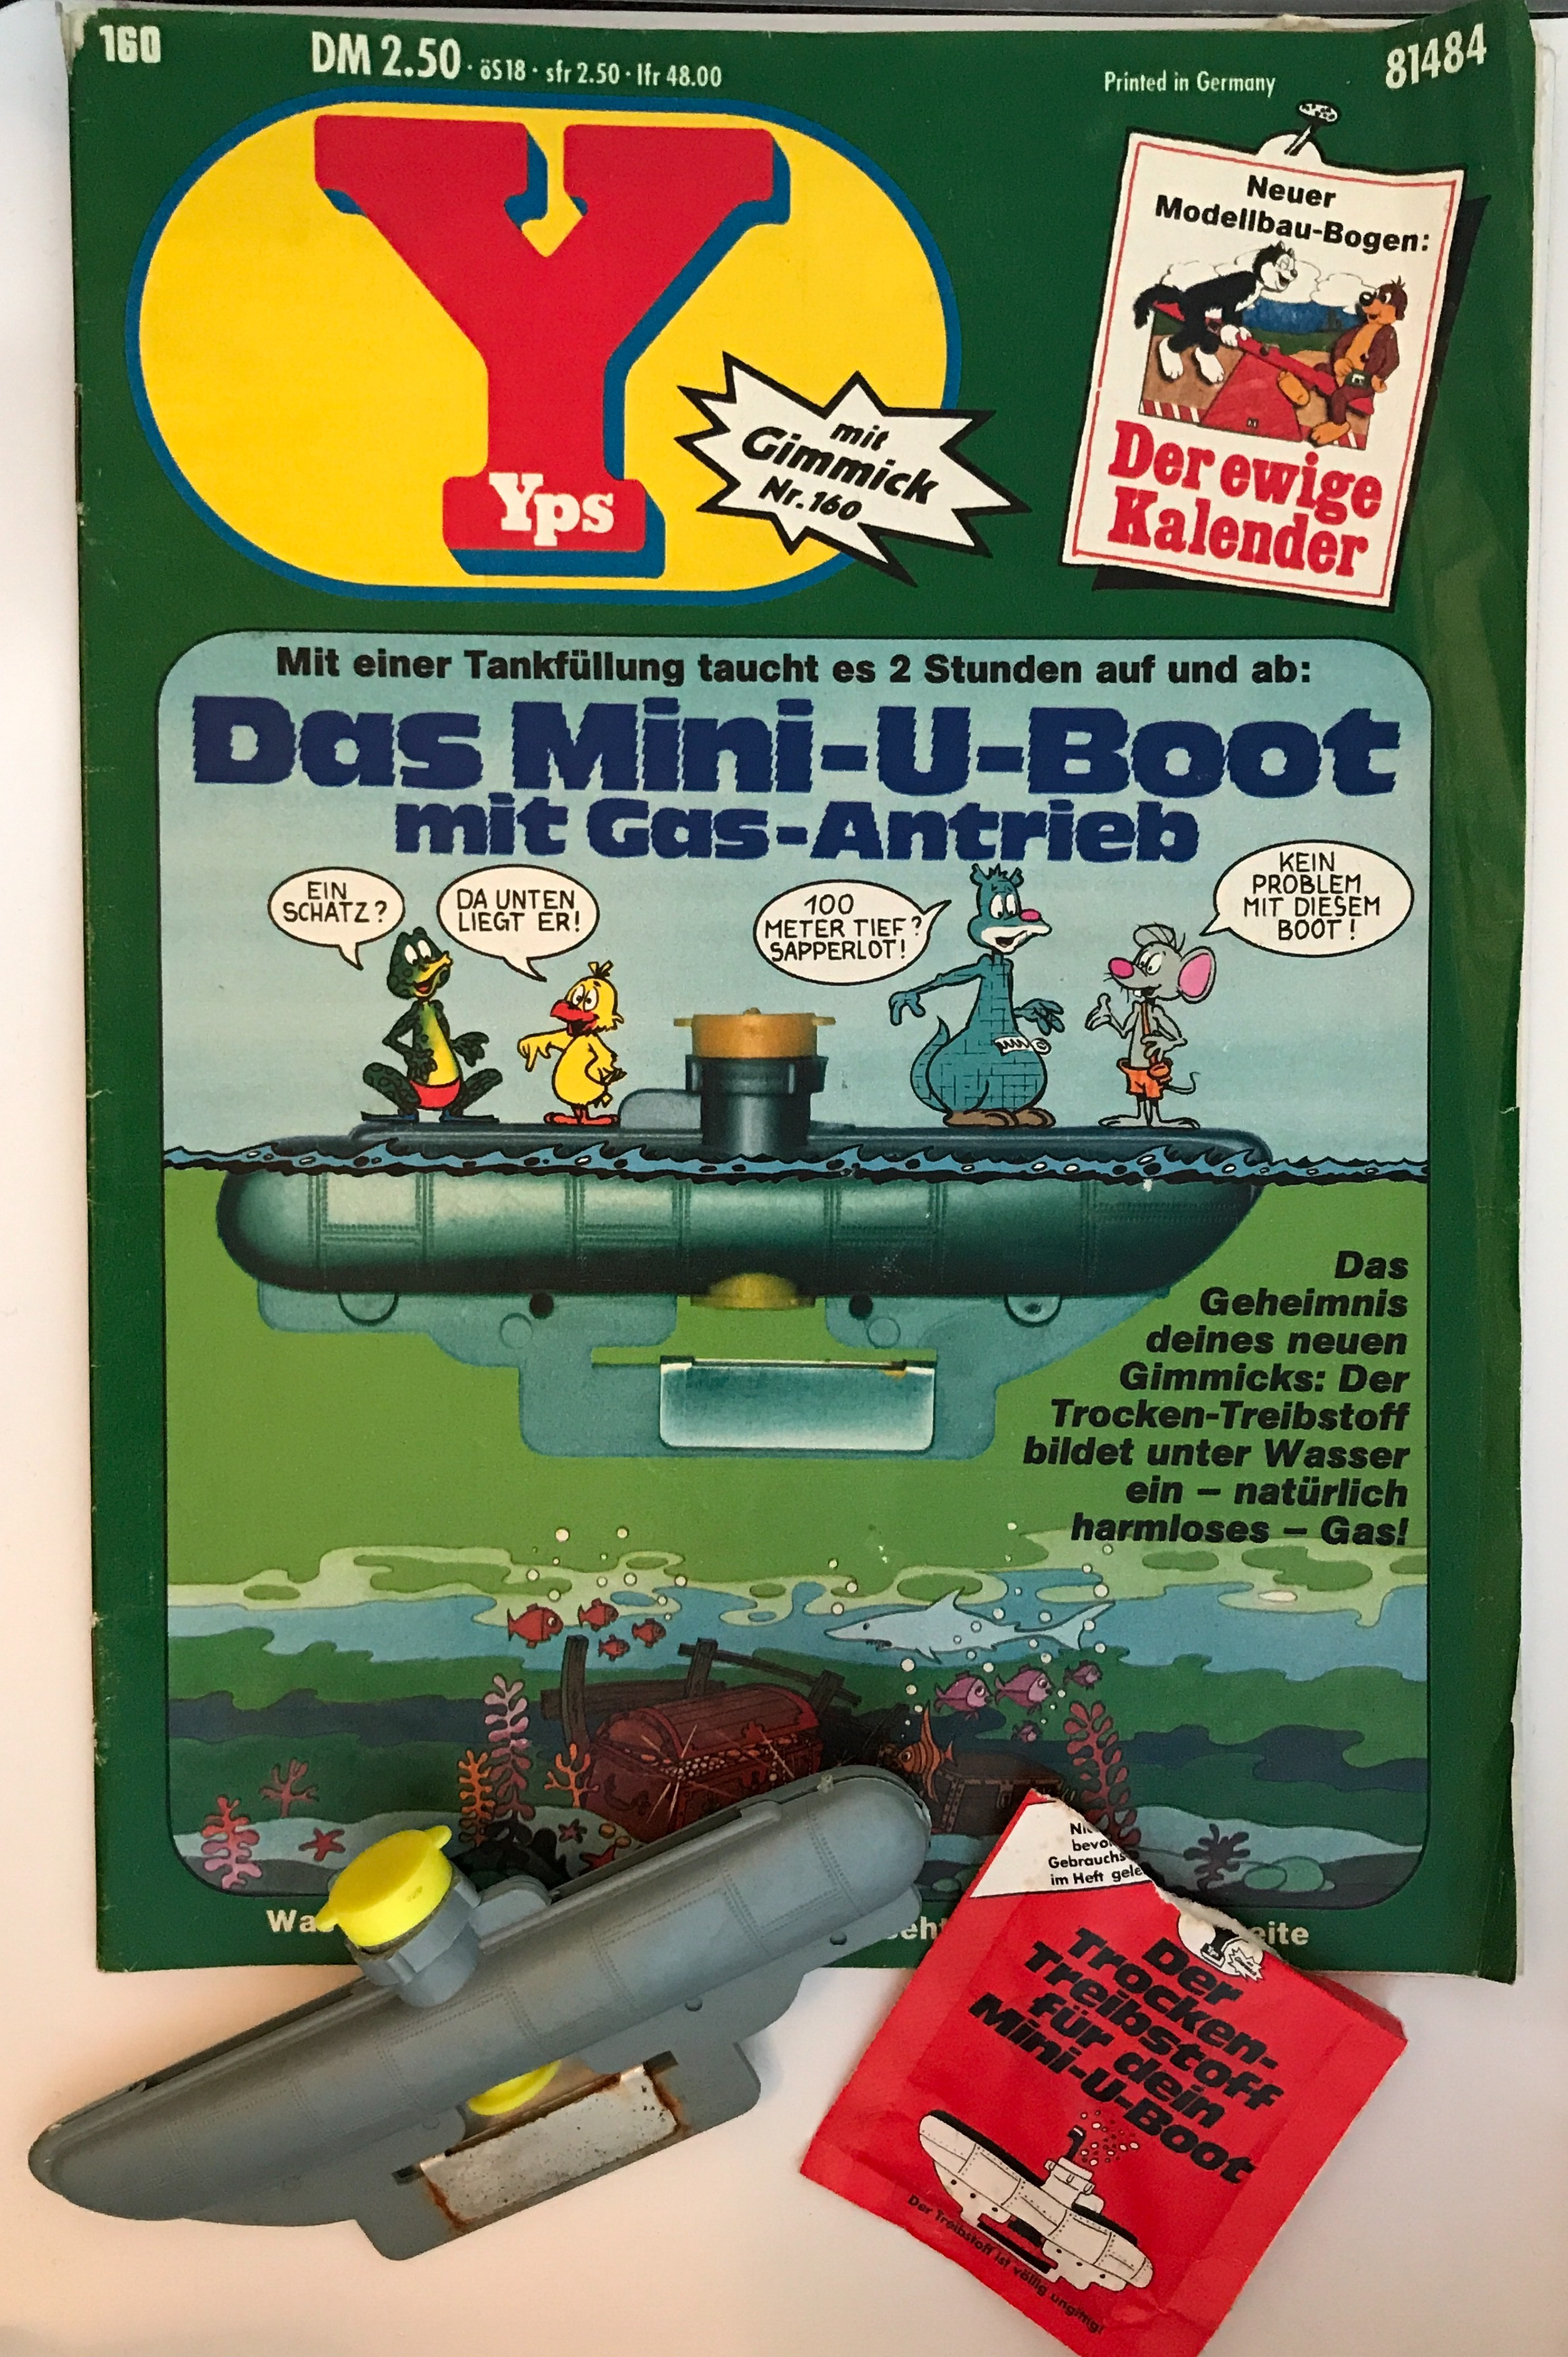 YPS_0160+Das+Mini-U-Boot+mit+Gas-Antrieb_Retroport_01